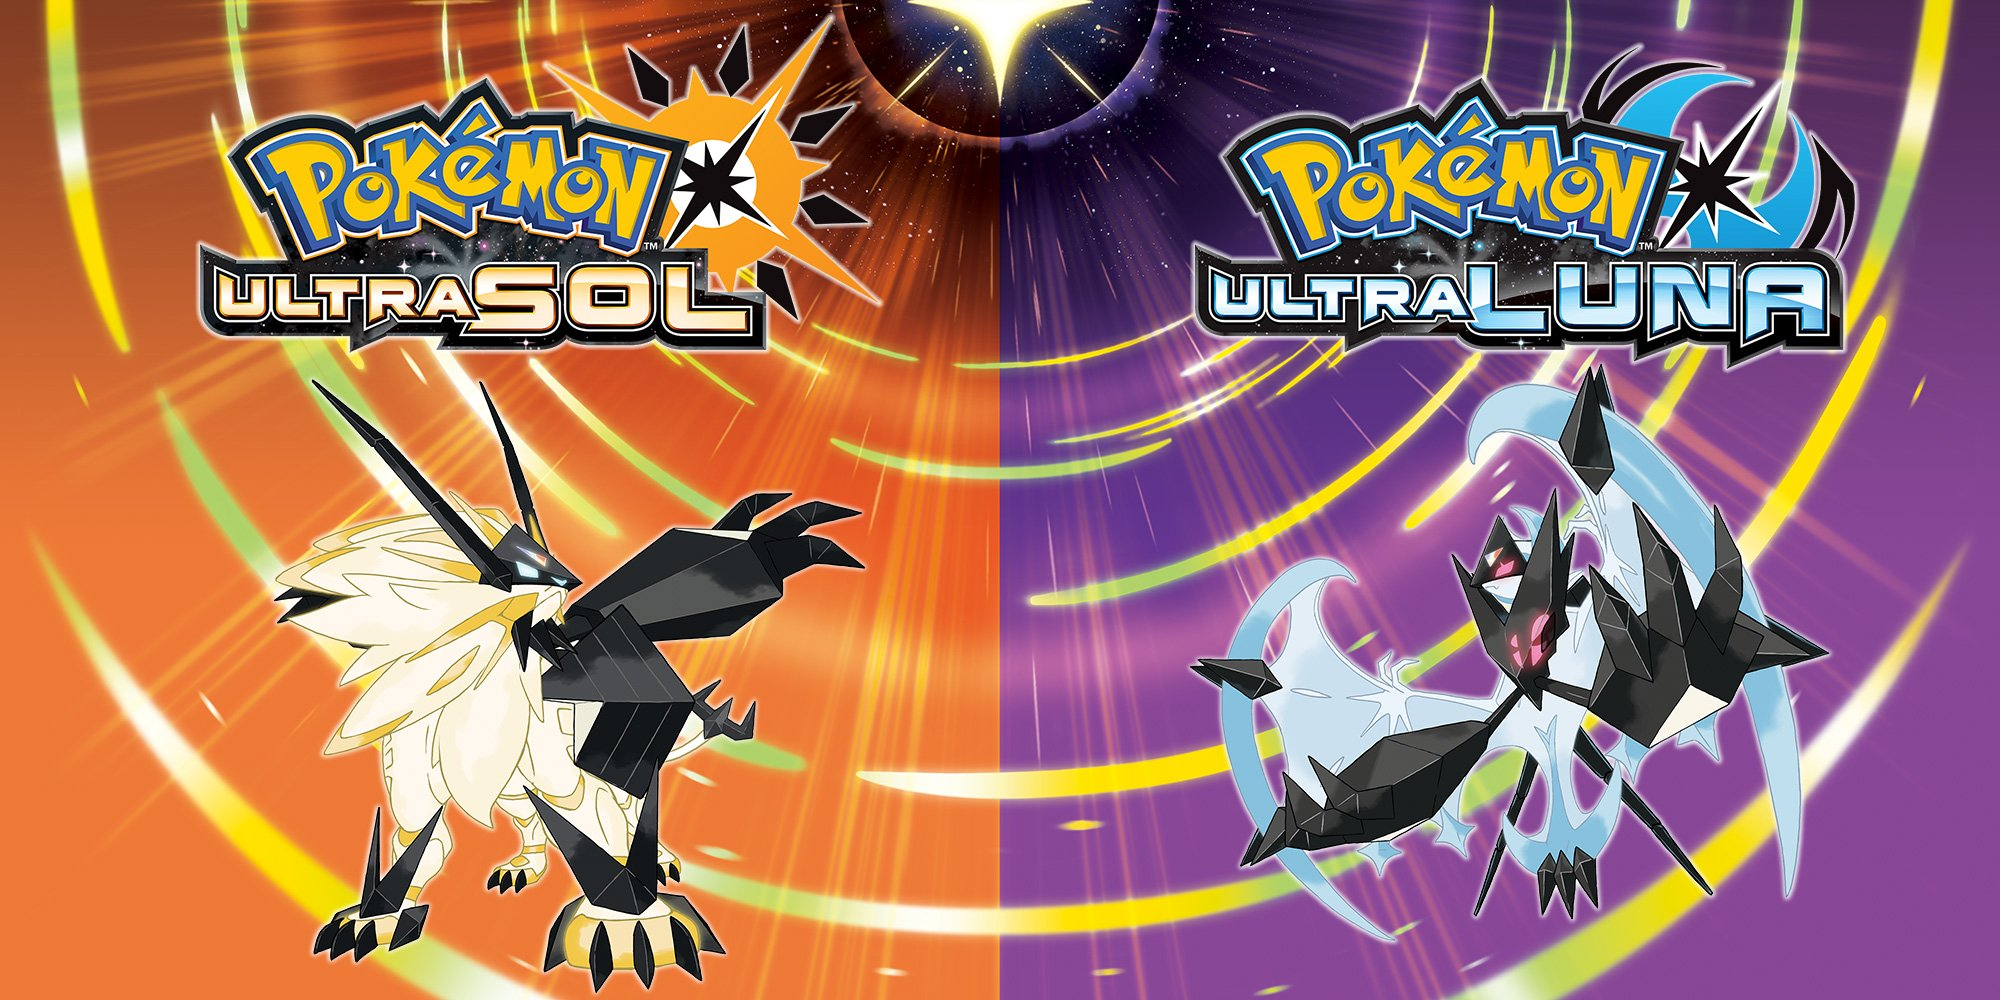 Análisis de Pokemon Ultrasol